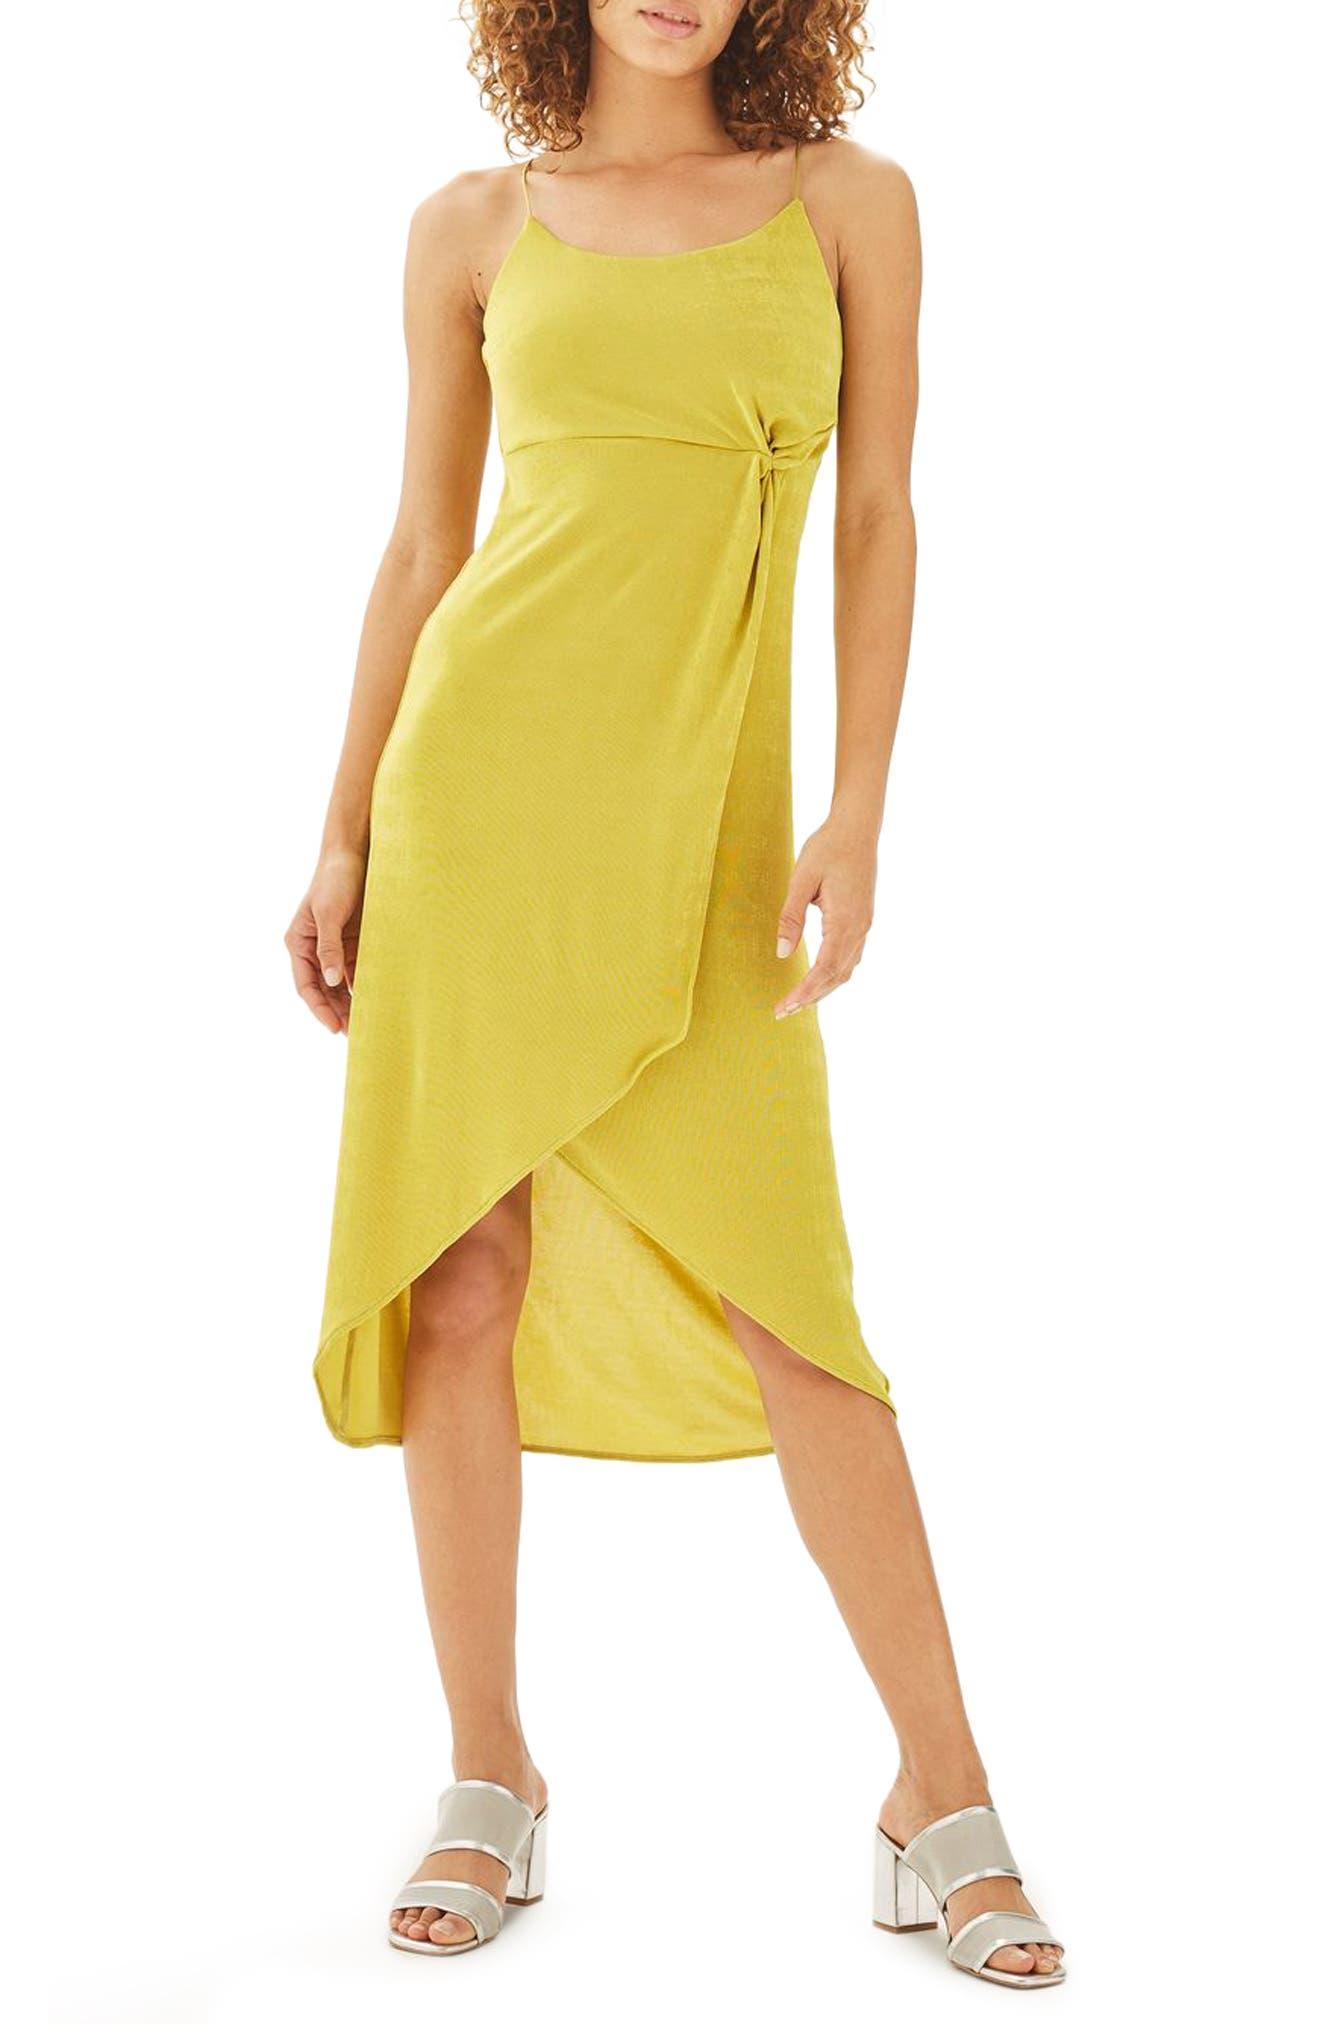 Topshop Knot Slinky Midi Dress